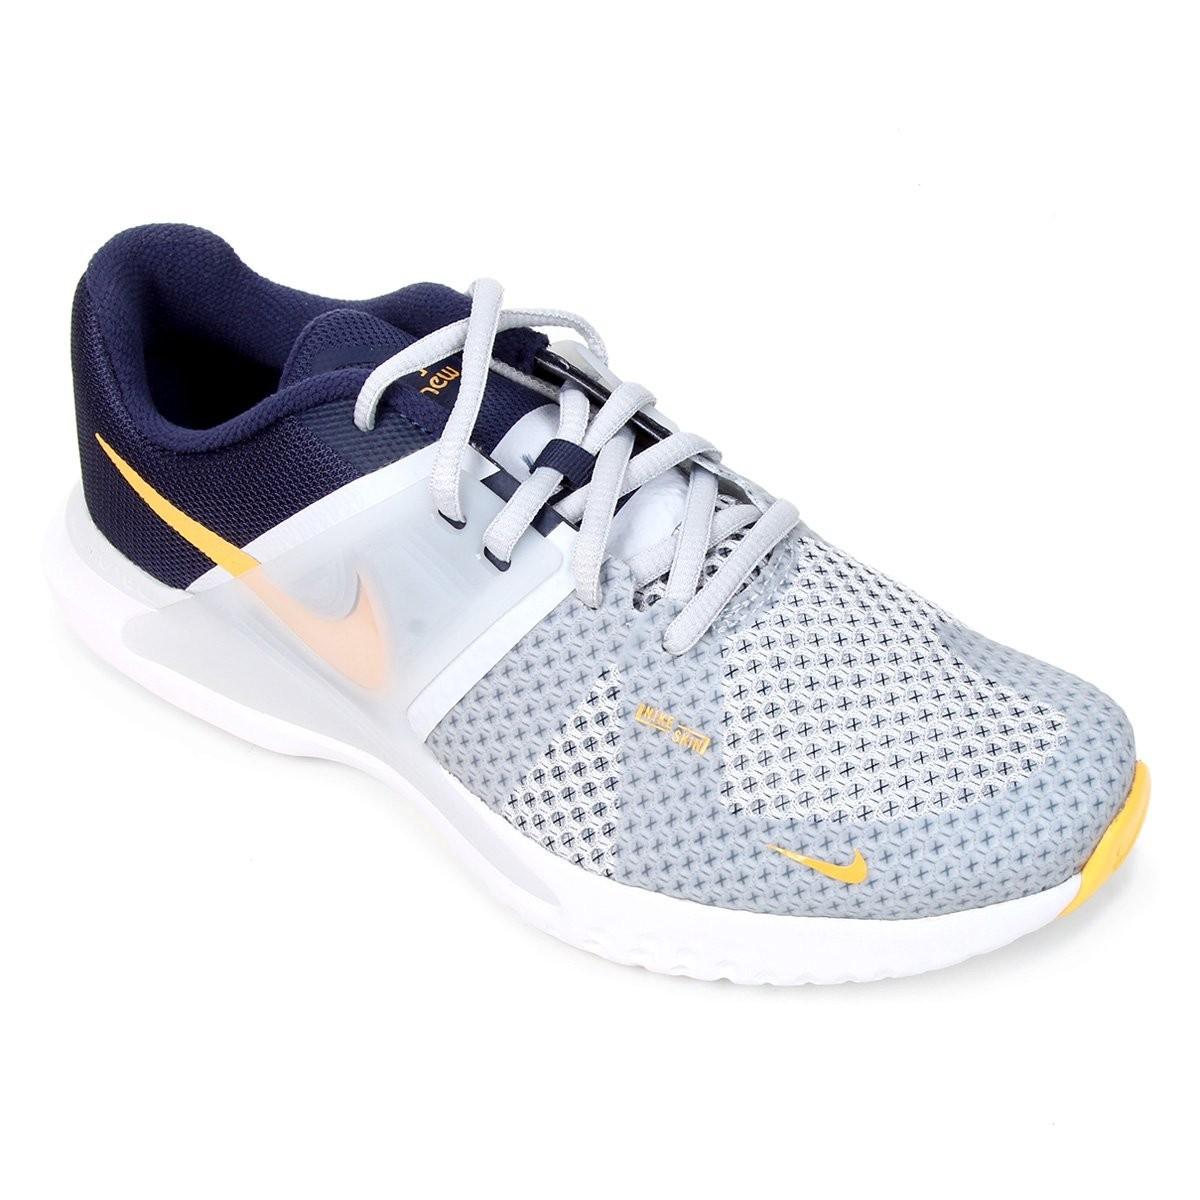 Tenis Masculino Esportivo Caminhada Nike Renew Fusion